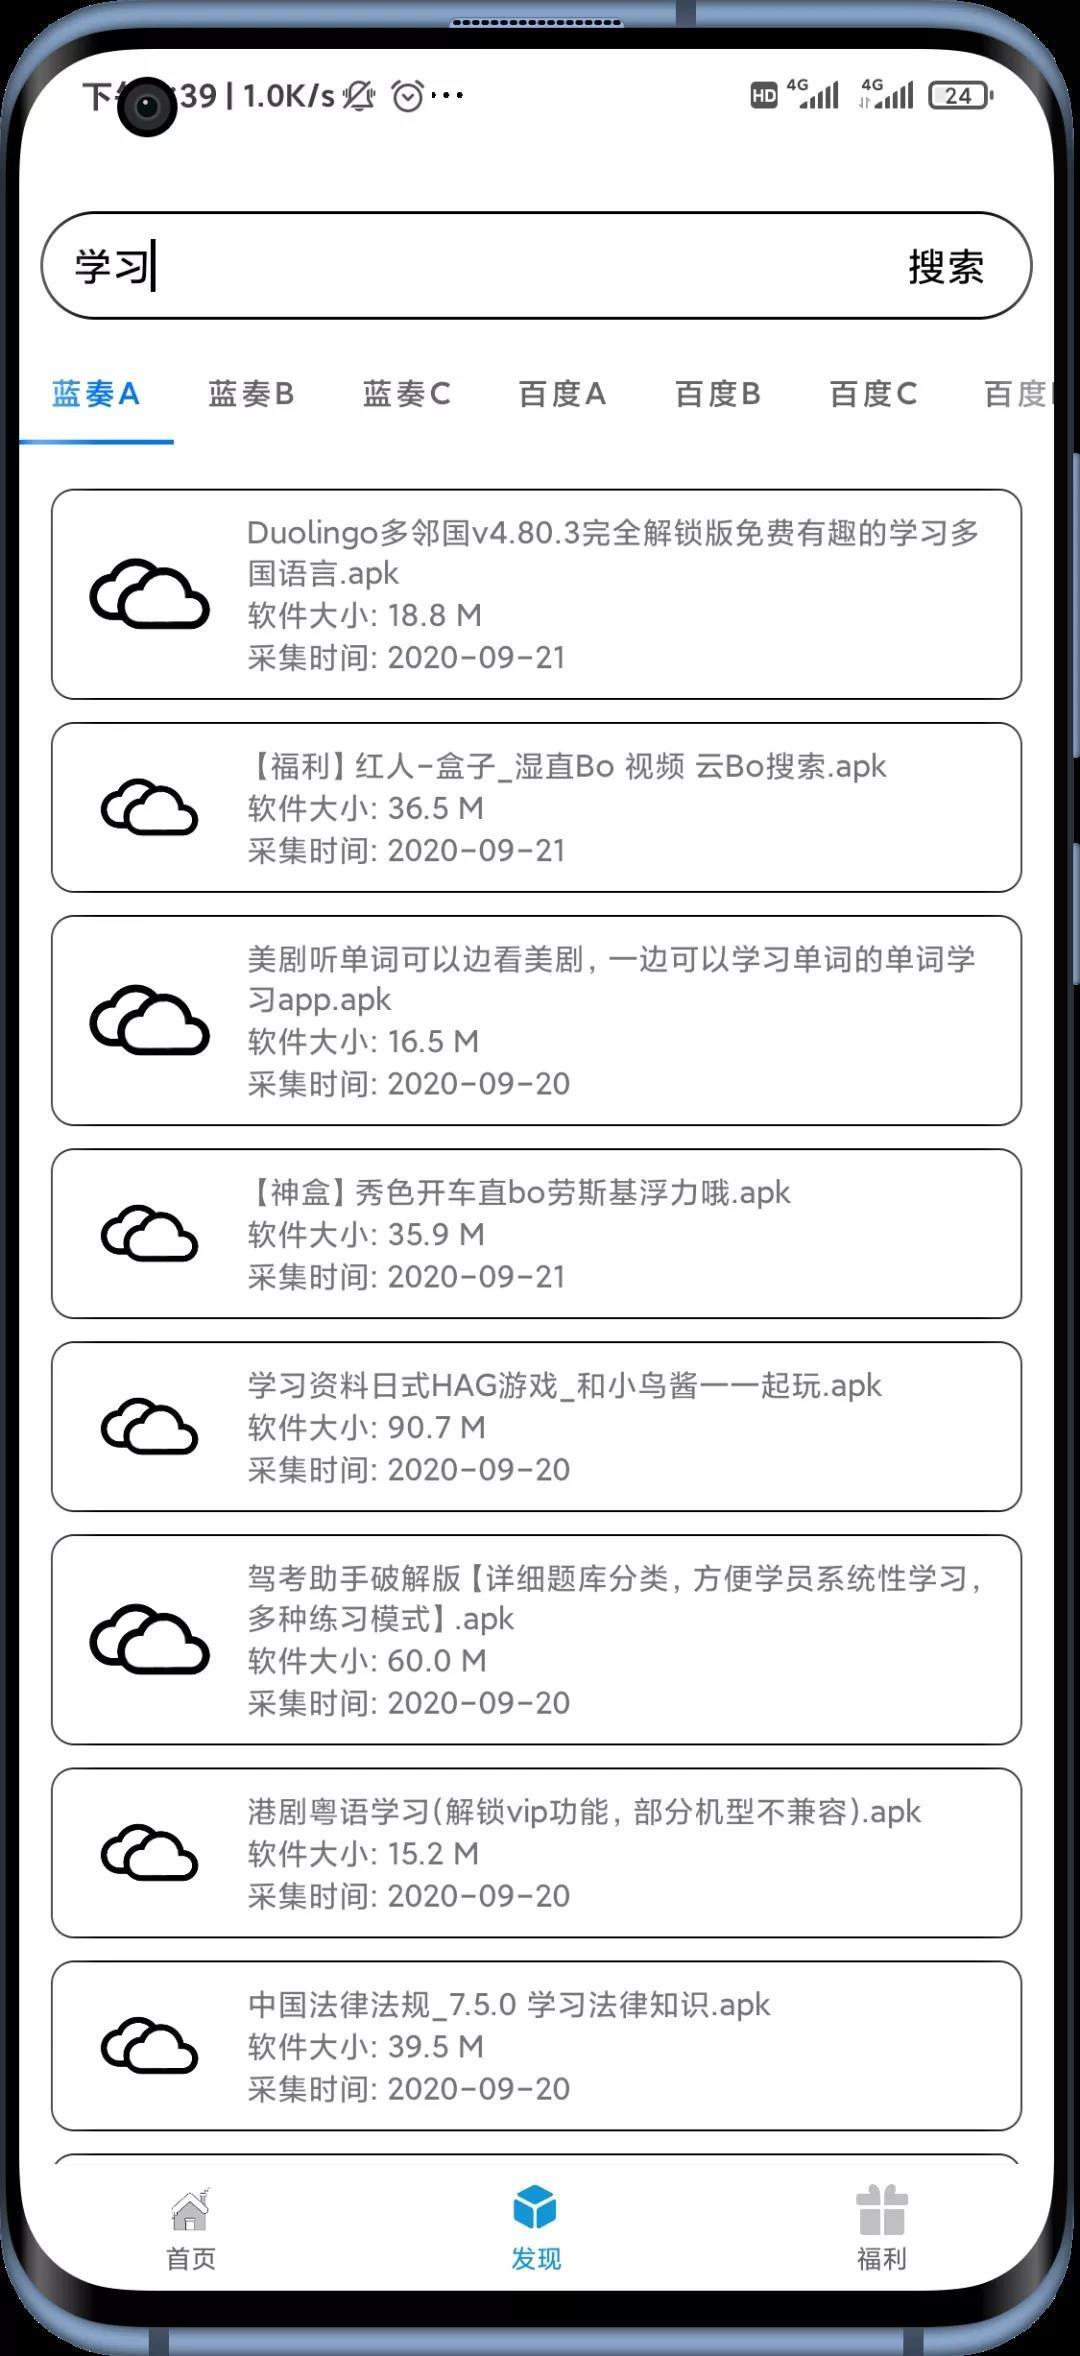 5ff0393a3ffa7d37b36b9cf6 聚云搜--专注于软件搜索下载